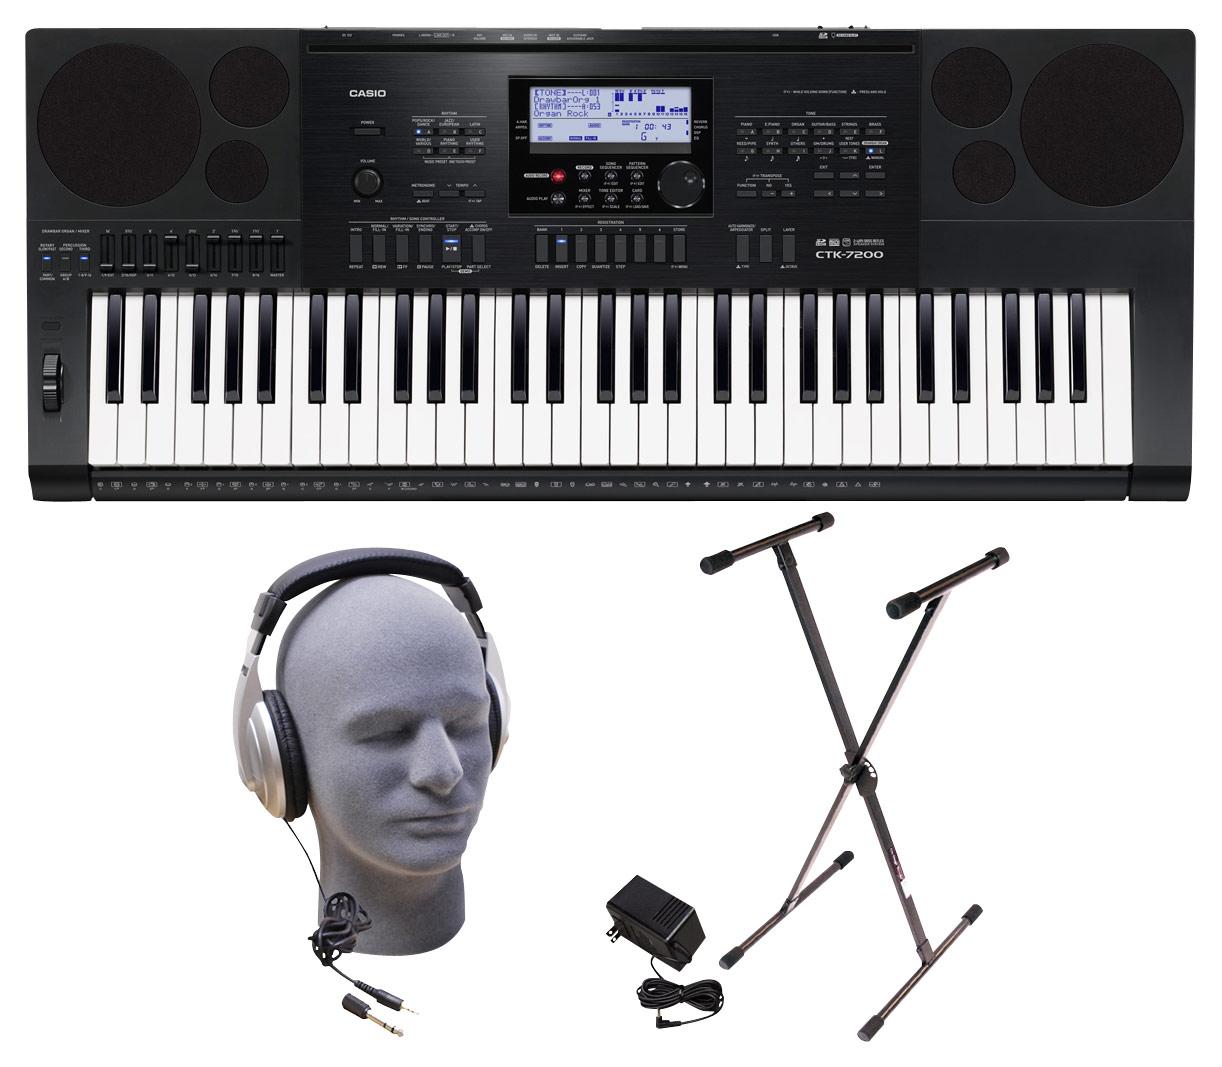 Casio - Keyboard with 61 Piano-Style Keys - Black